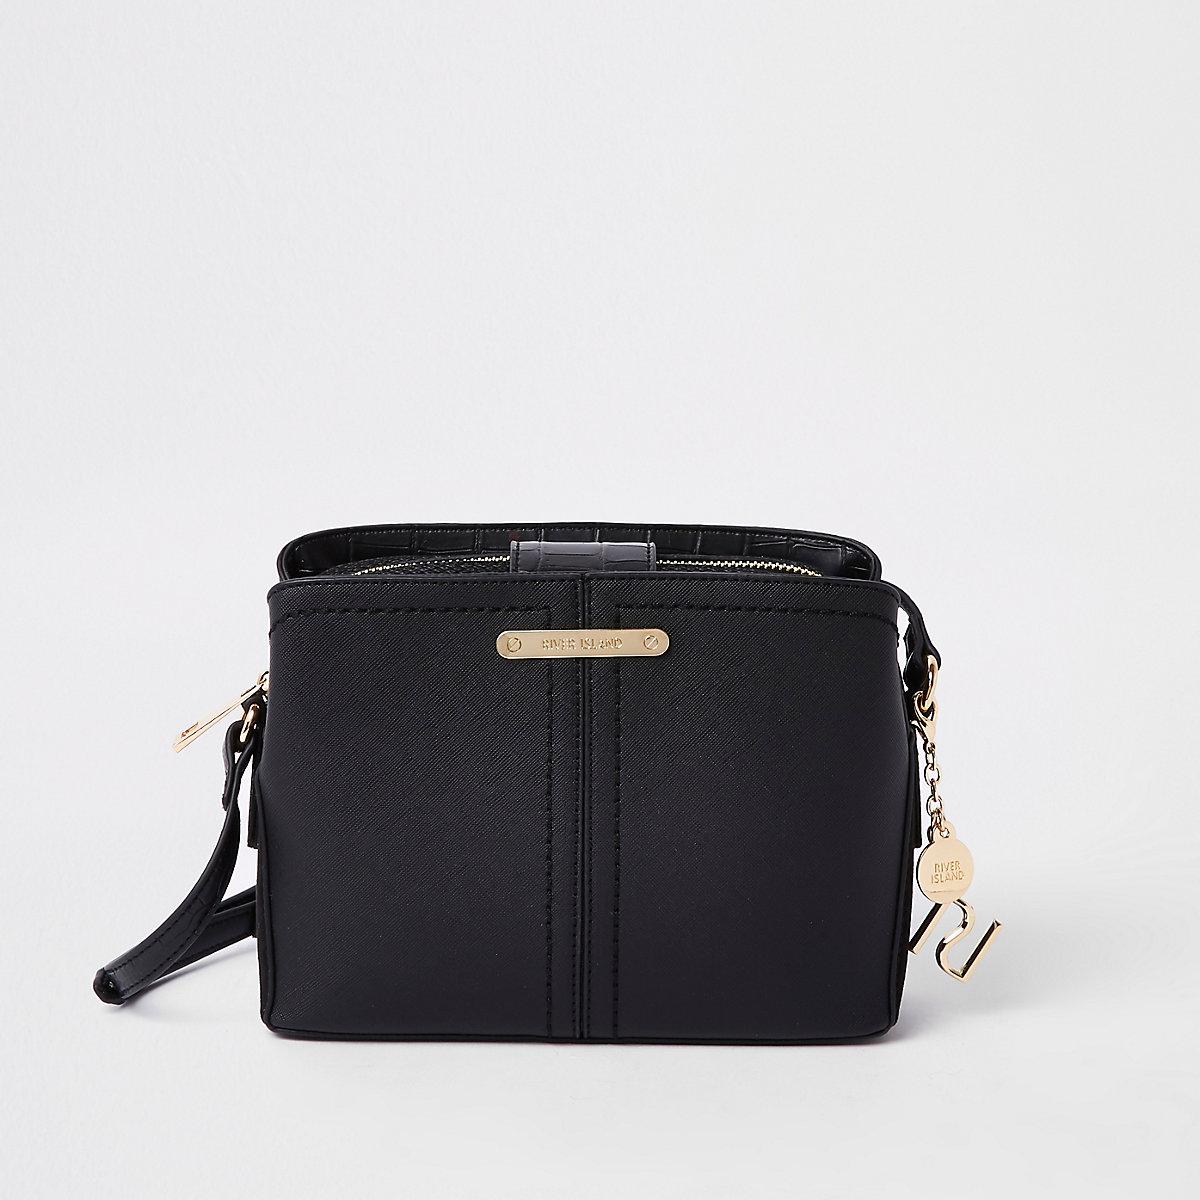 Black open top triple compartment bag